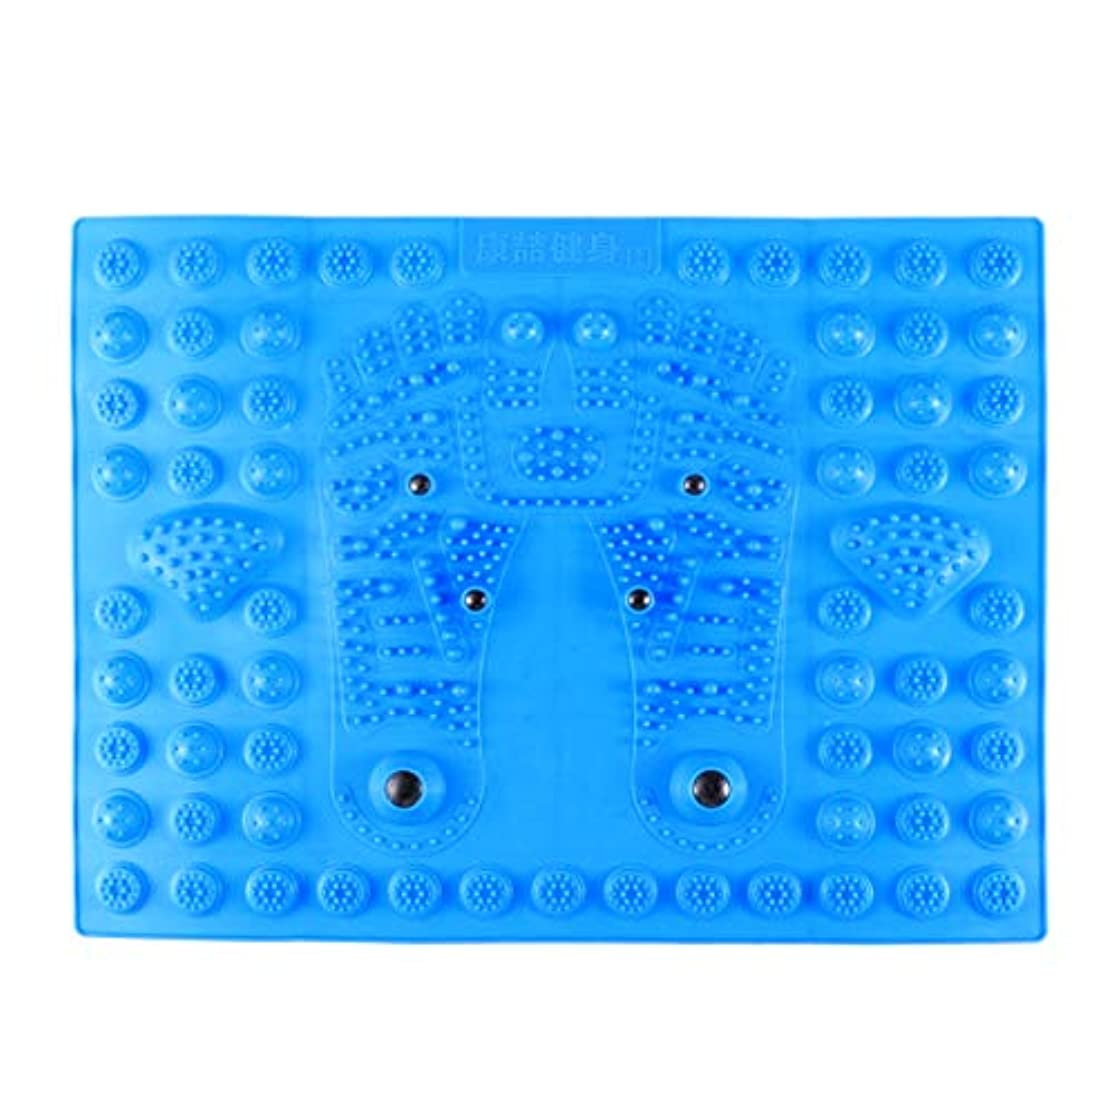 Healifty 指圧フットマットフット磁気療法マッサージャーガーデンマッサージパッド(ブルー)